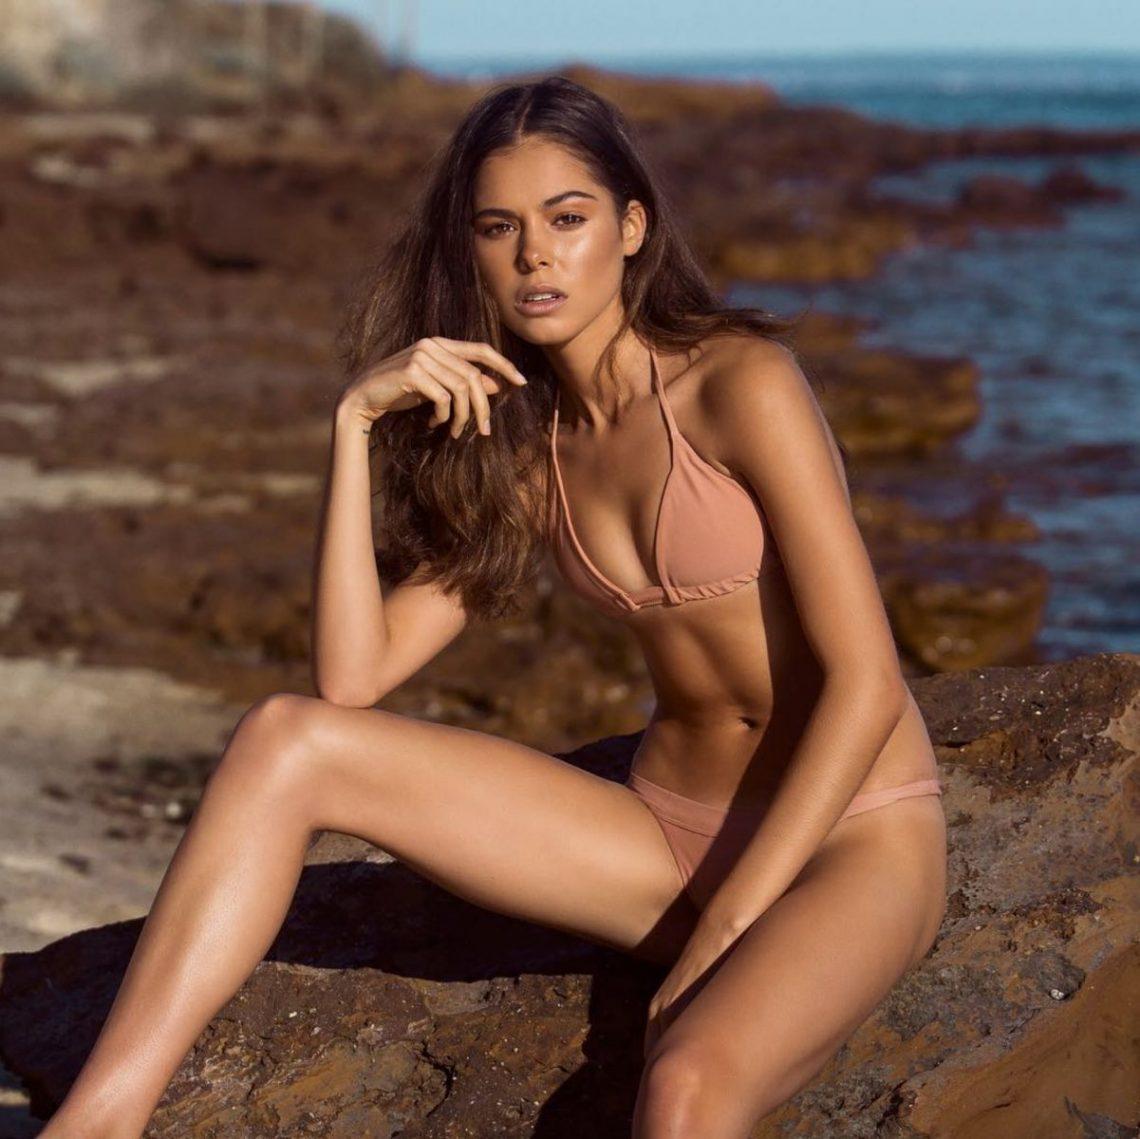 Balistarz-model-Elissa-Burns-sitting-on-beach-rock-in-her-sexy-calm-colour-bikini